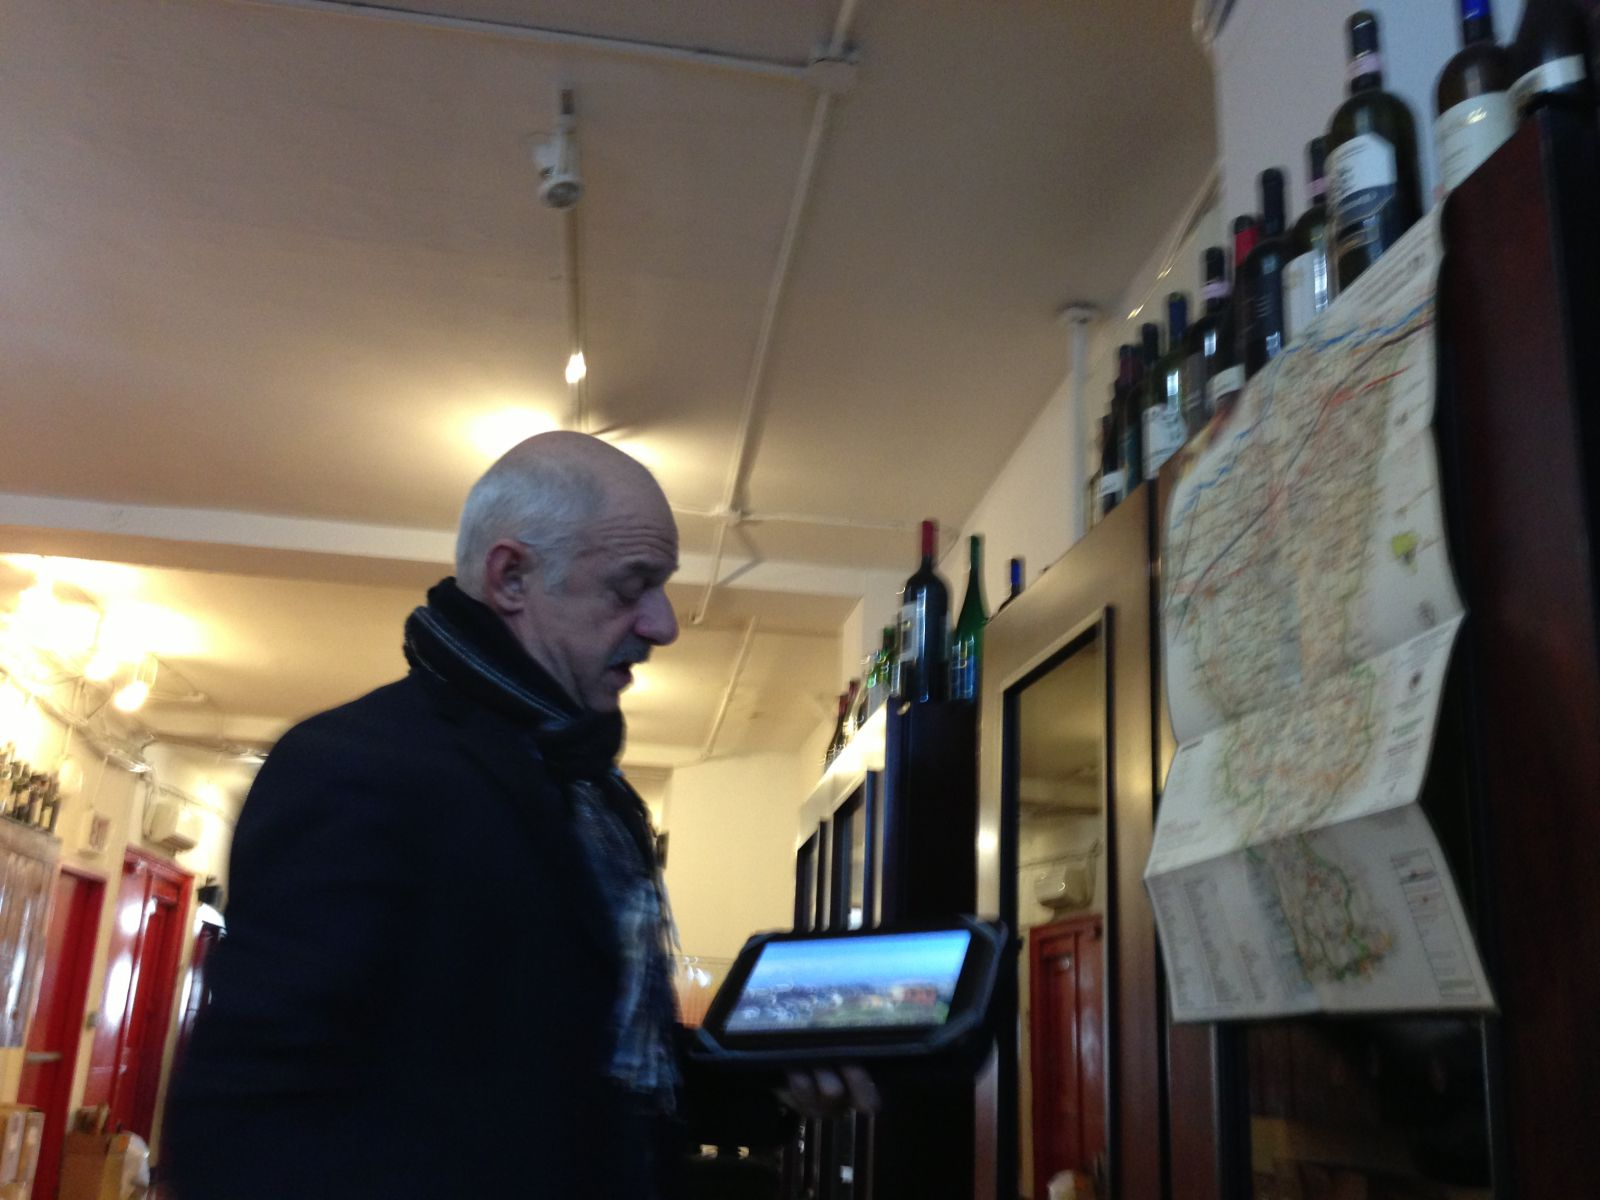 Frecciarossa visit to Nyc